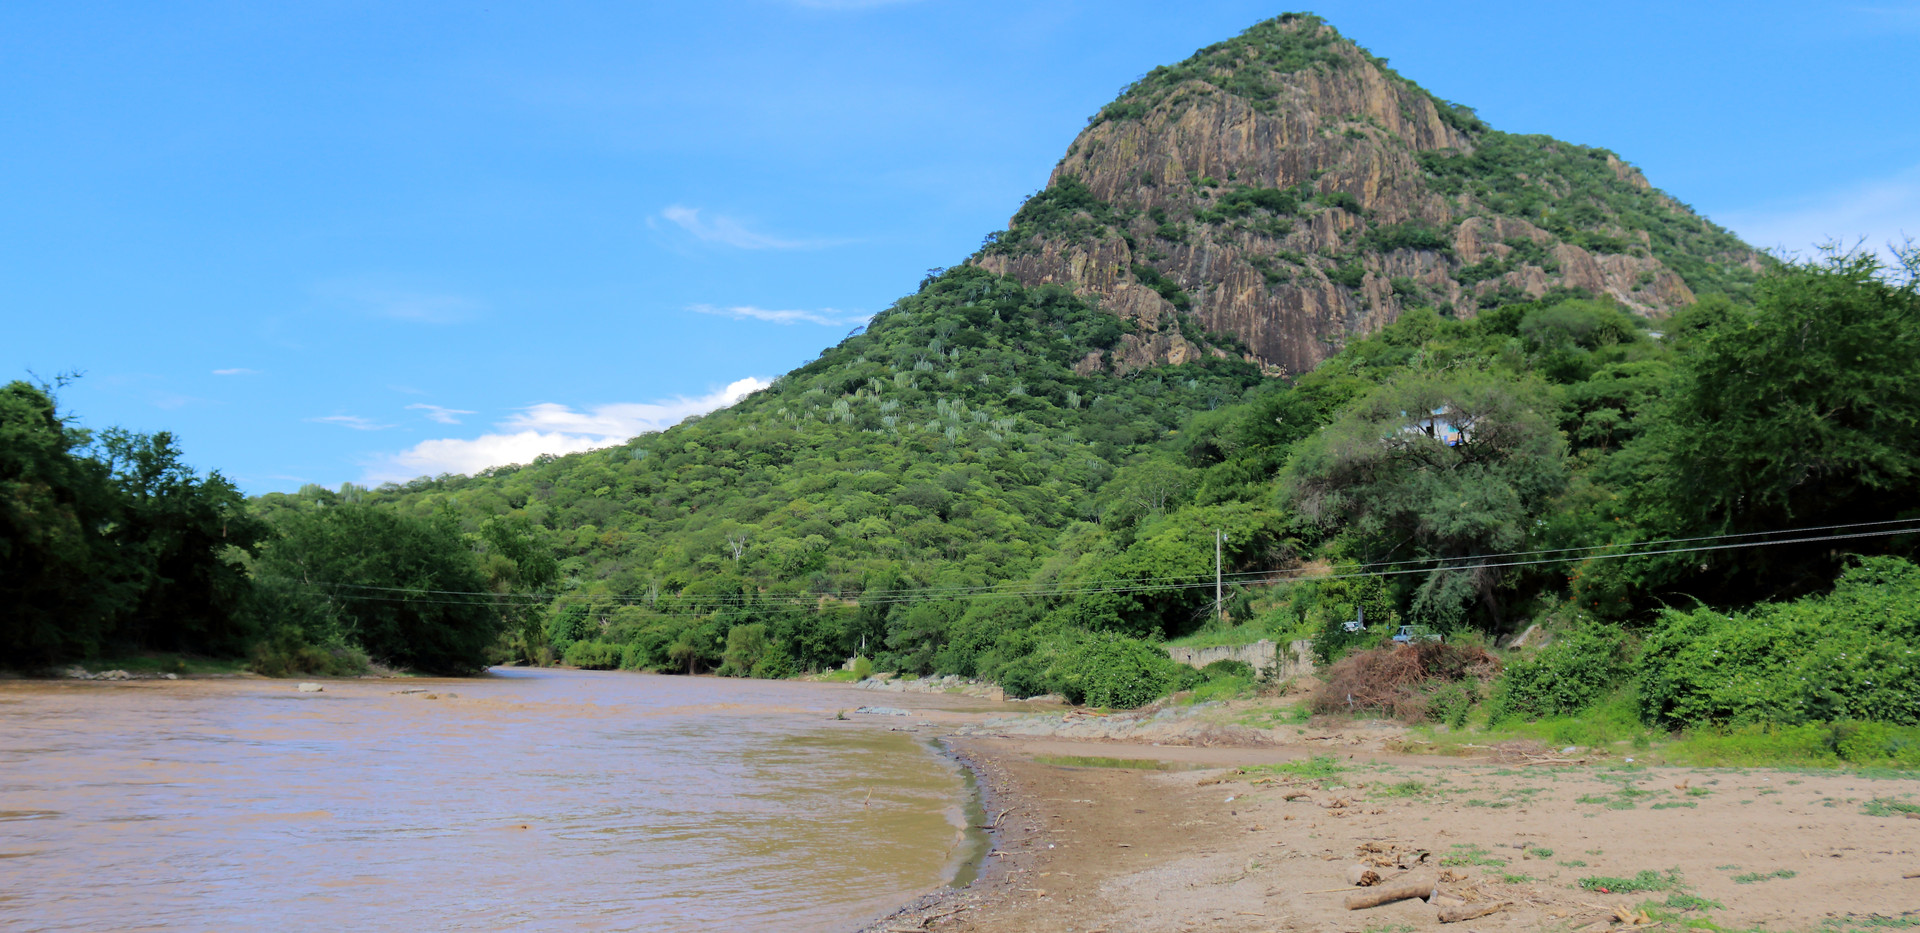 The rock of Huehuepiaxtla